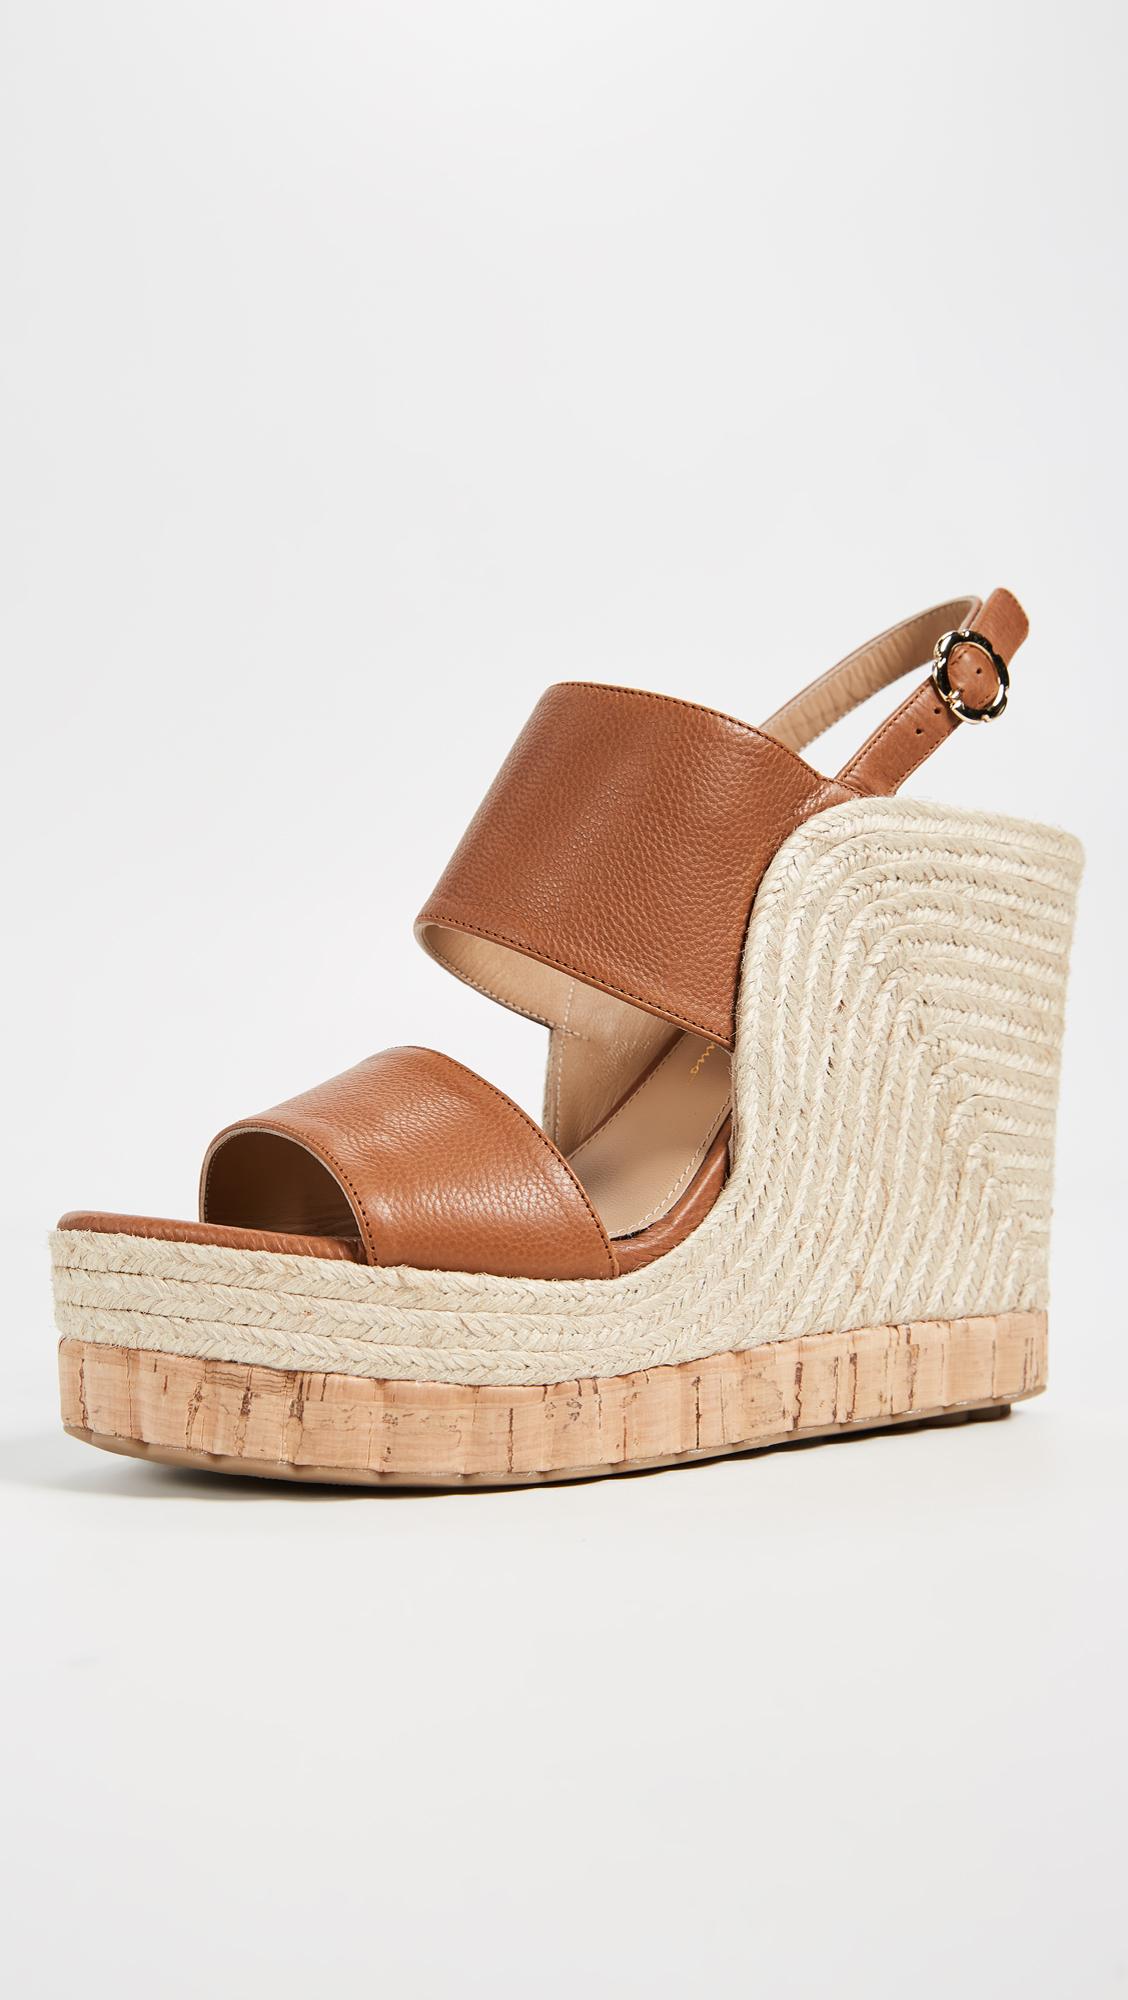 0f5971100fe Salvatore Ferragamo Maratea Wedge Sandals